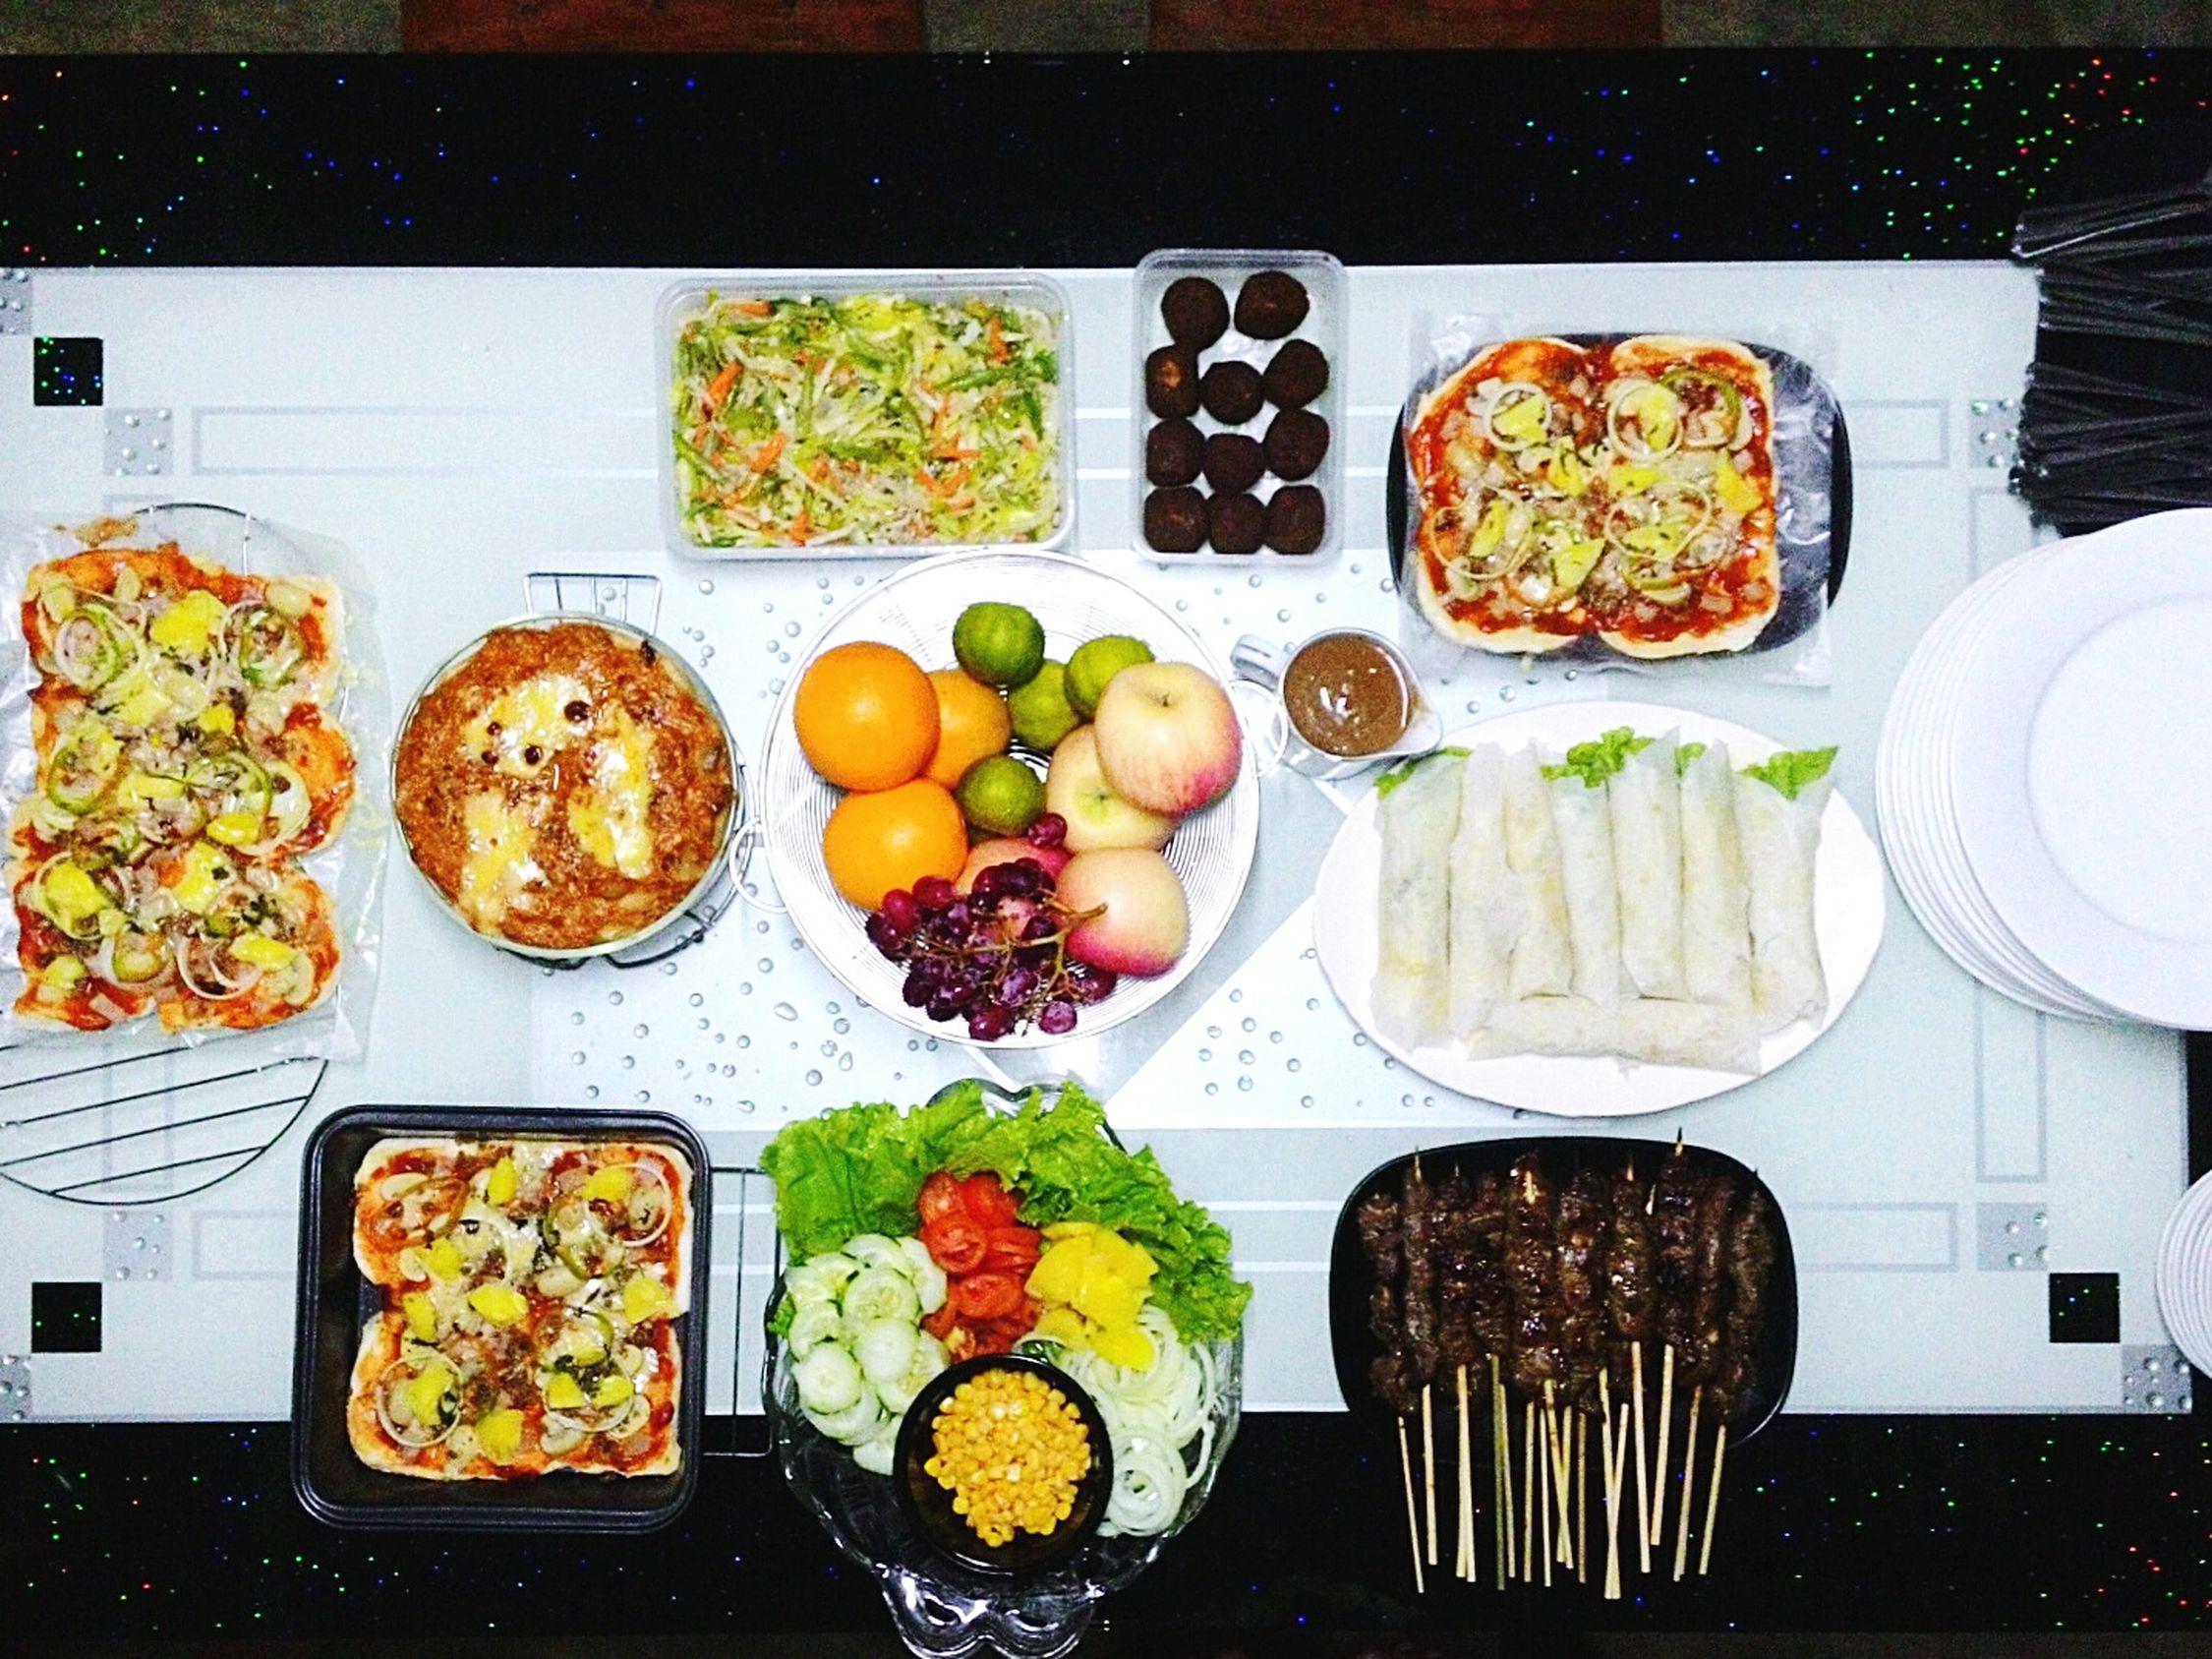 There you go. 🍴 Foodphotography Foodporn Newyearsfood Food Eyeem Philippines Mobilephotography